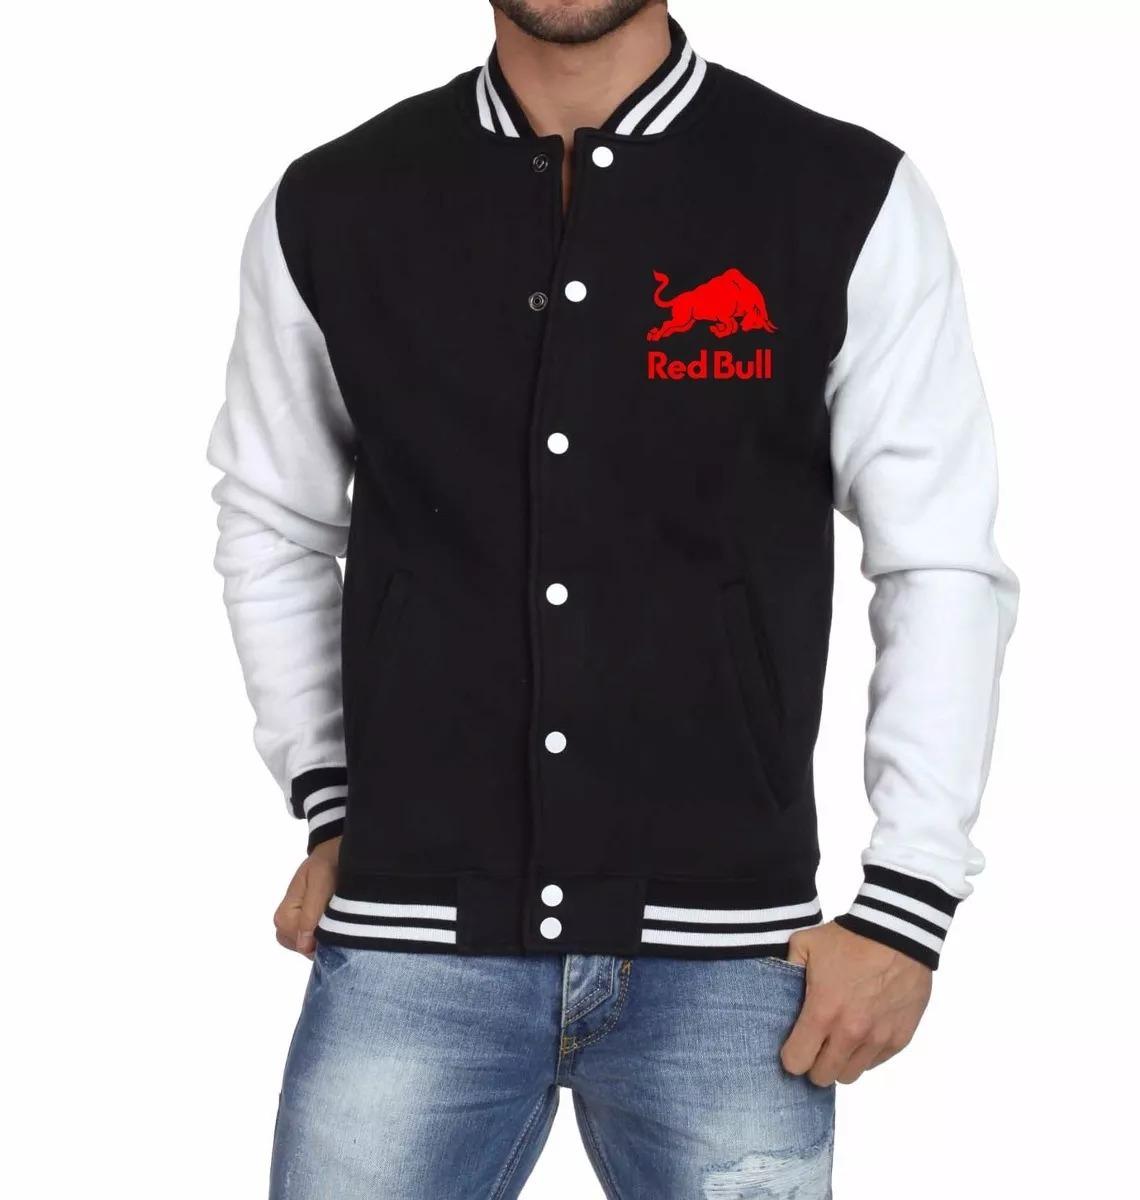 33099d9932235 jaqueta college red bull masculina casaco moletom. Carregando zoom.